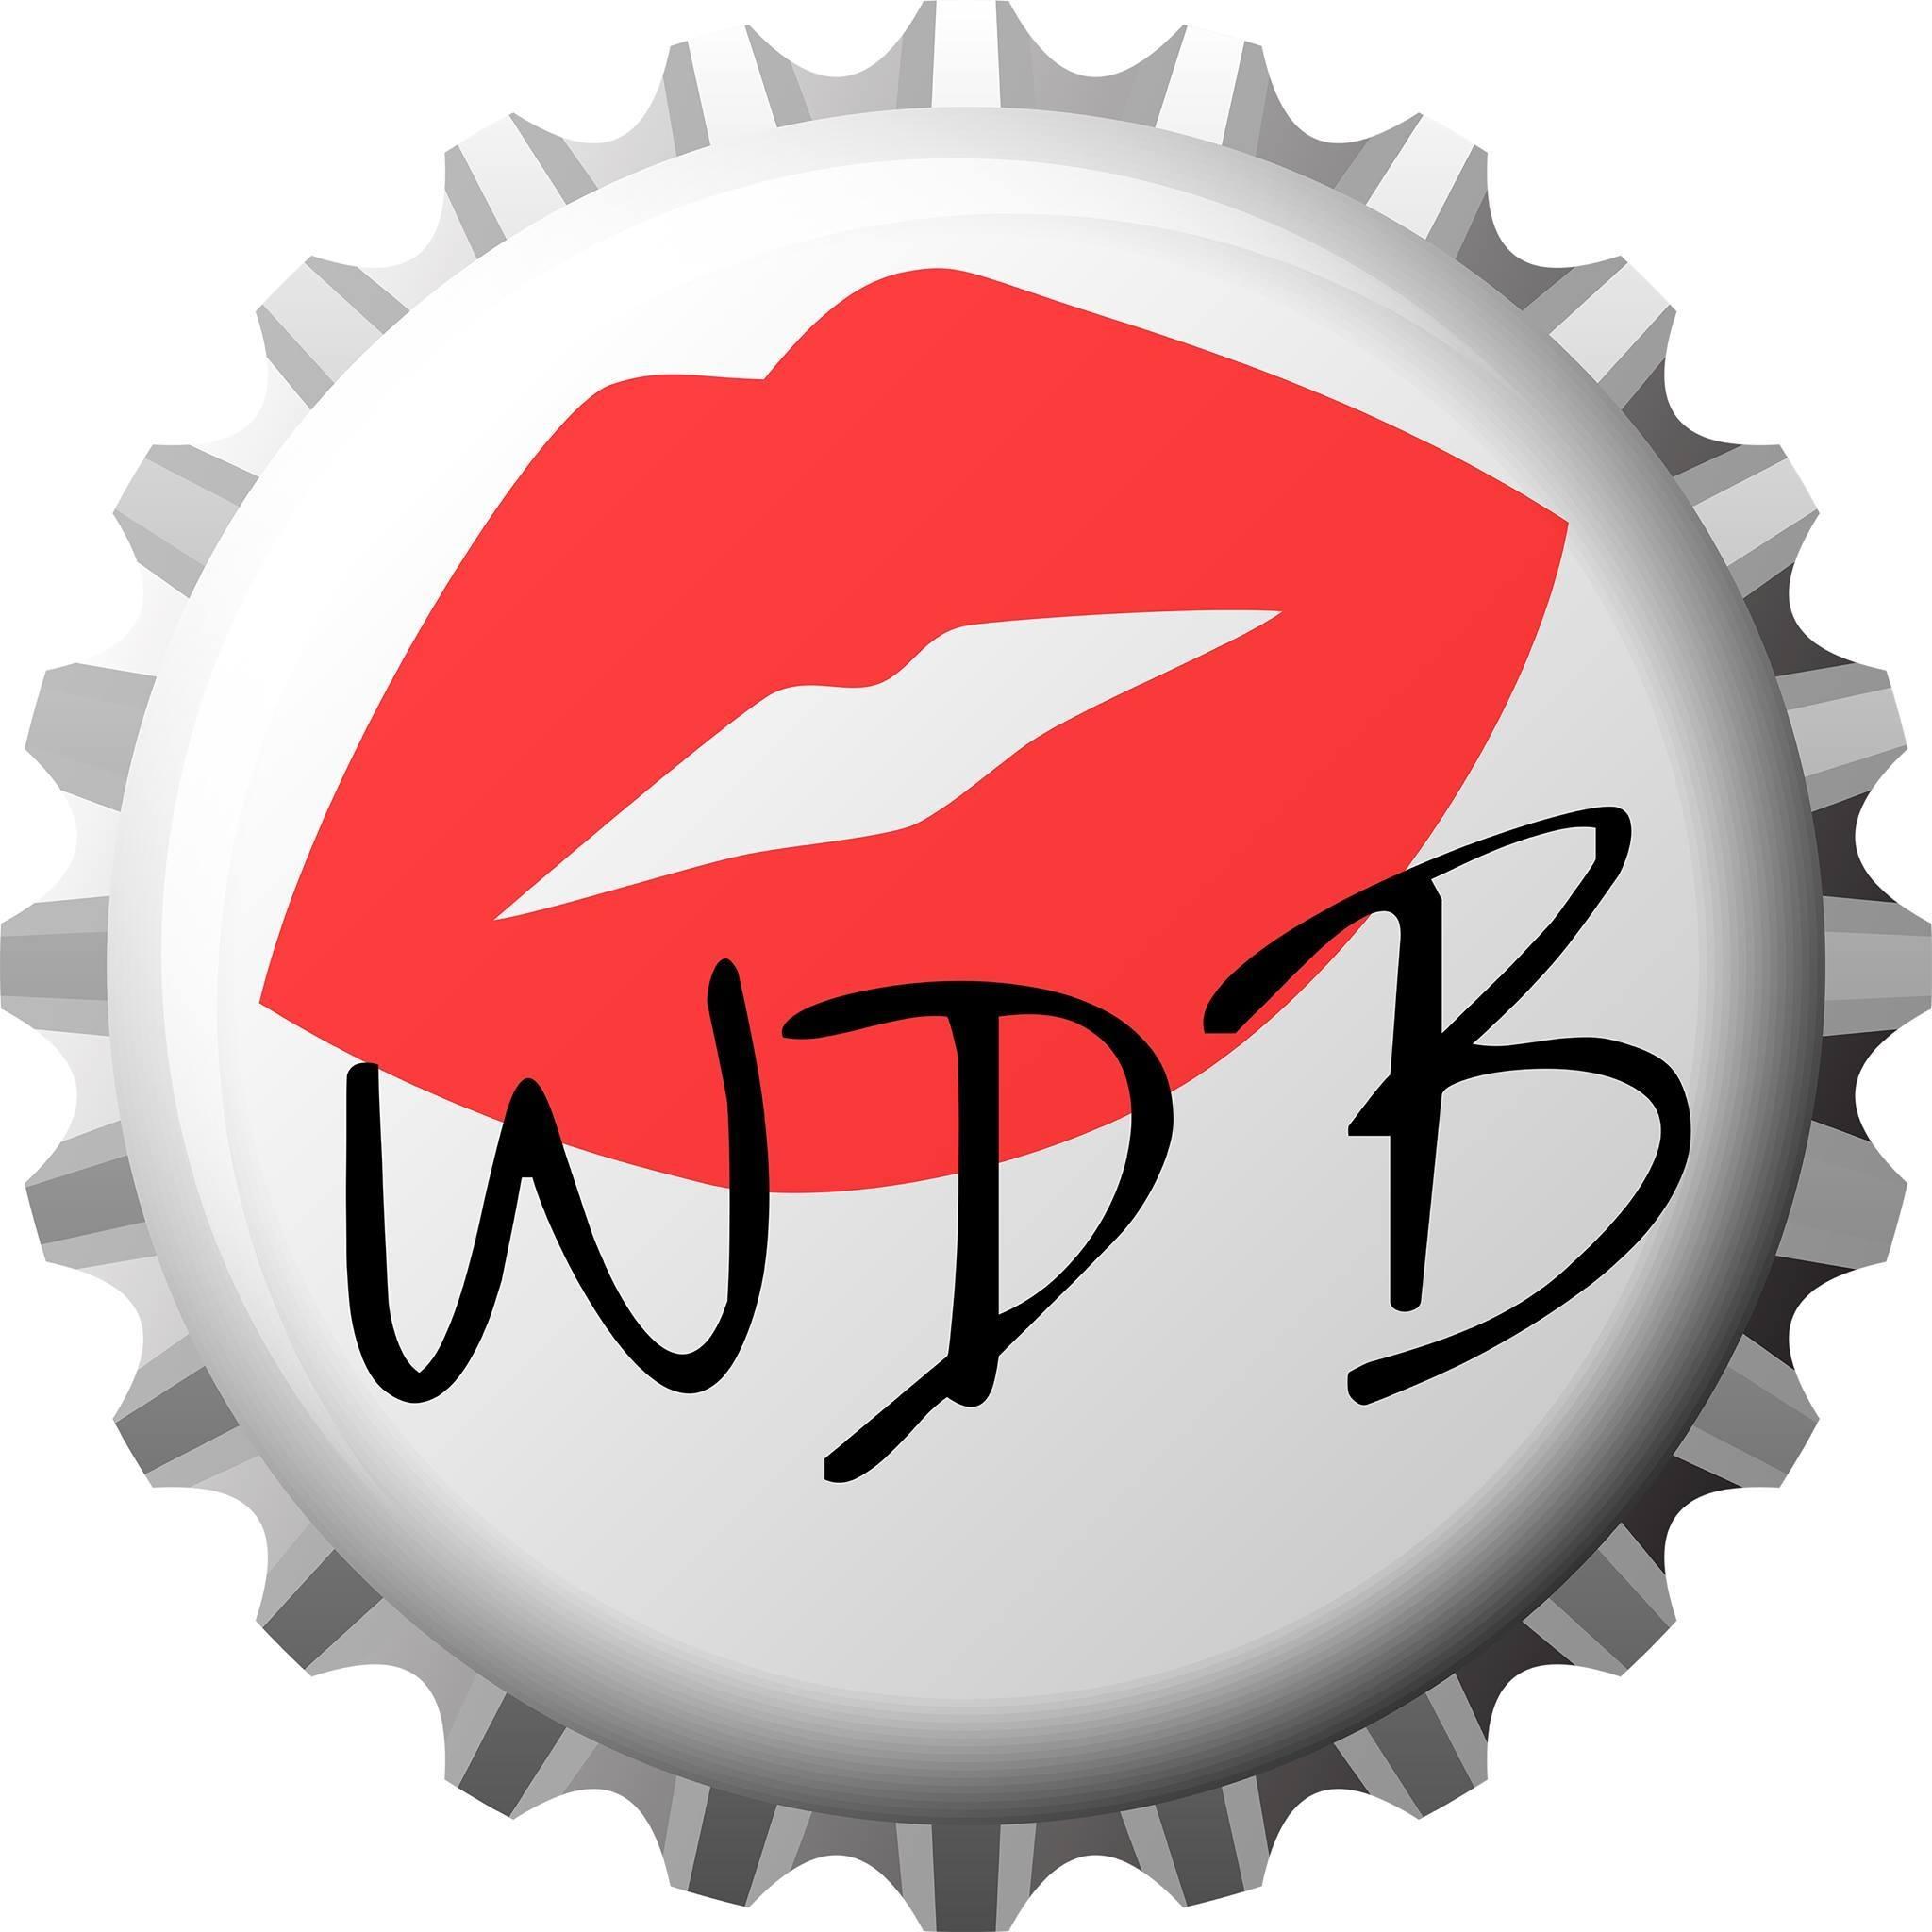 www.womendrinkingbeer.com